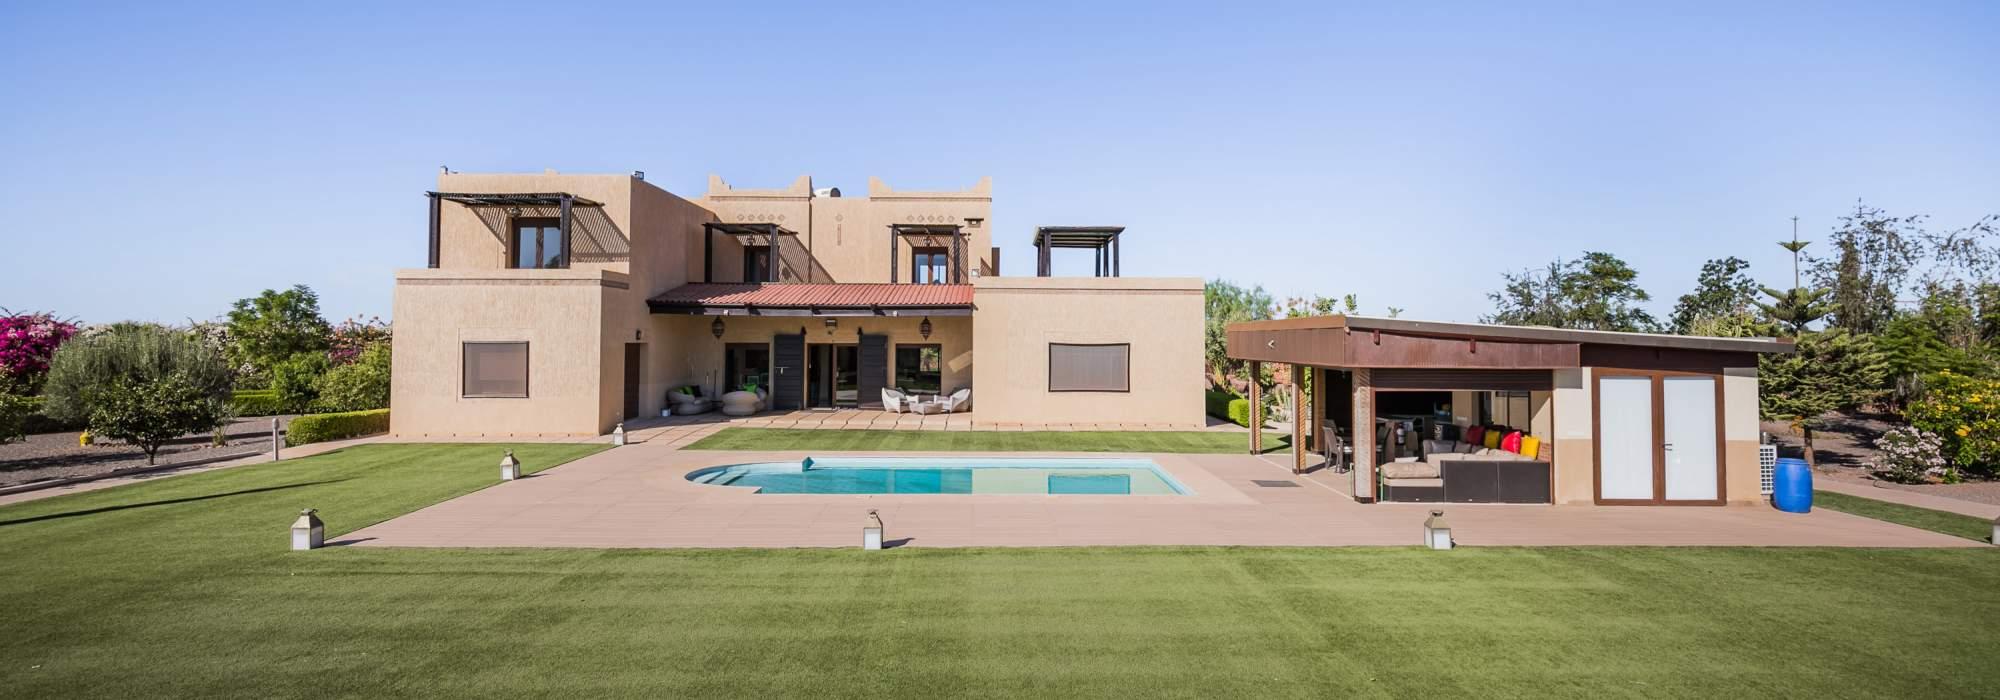 vente villa contemporaine route d'ourika marrakech